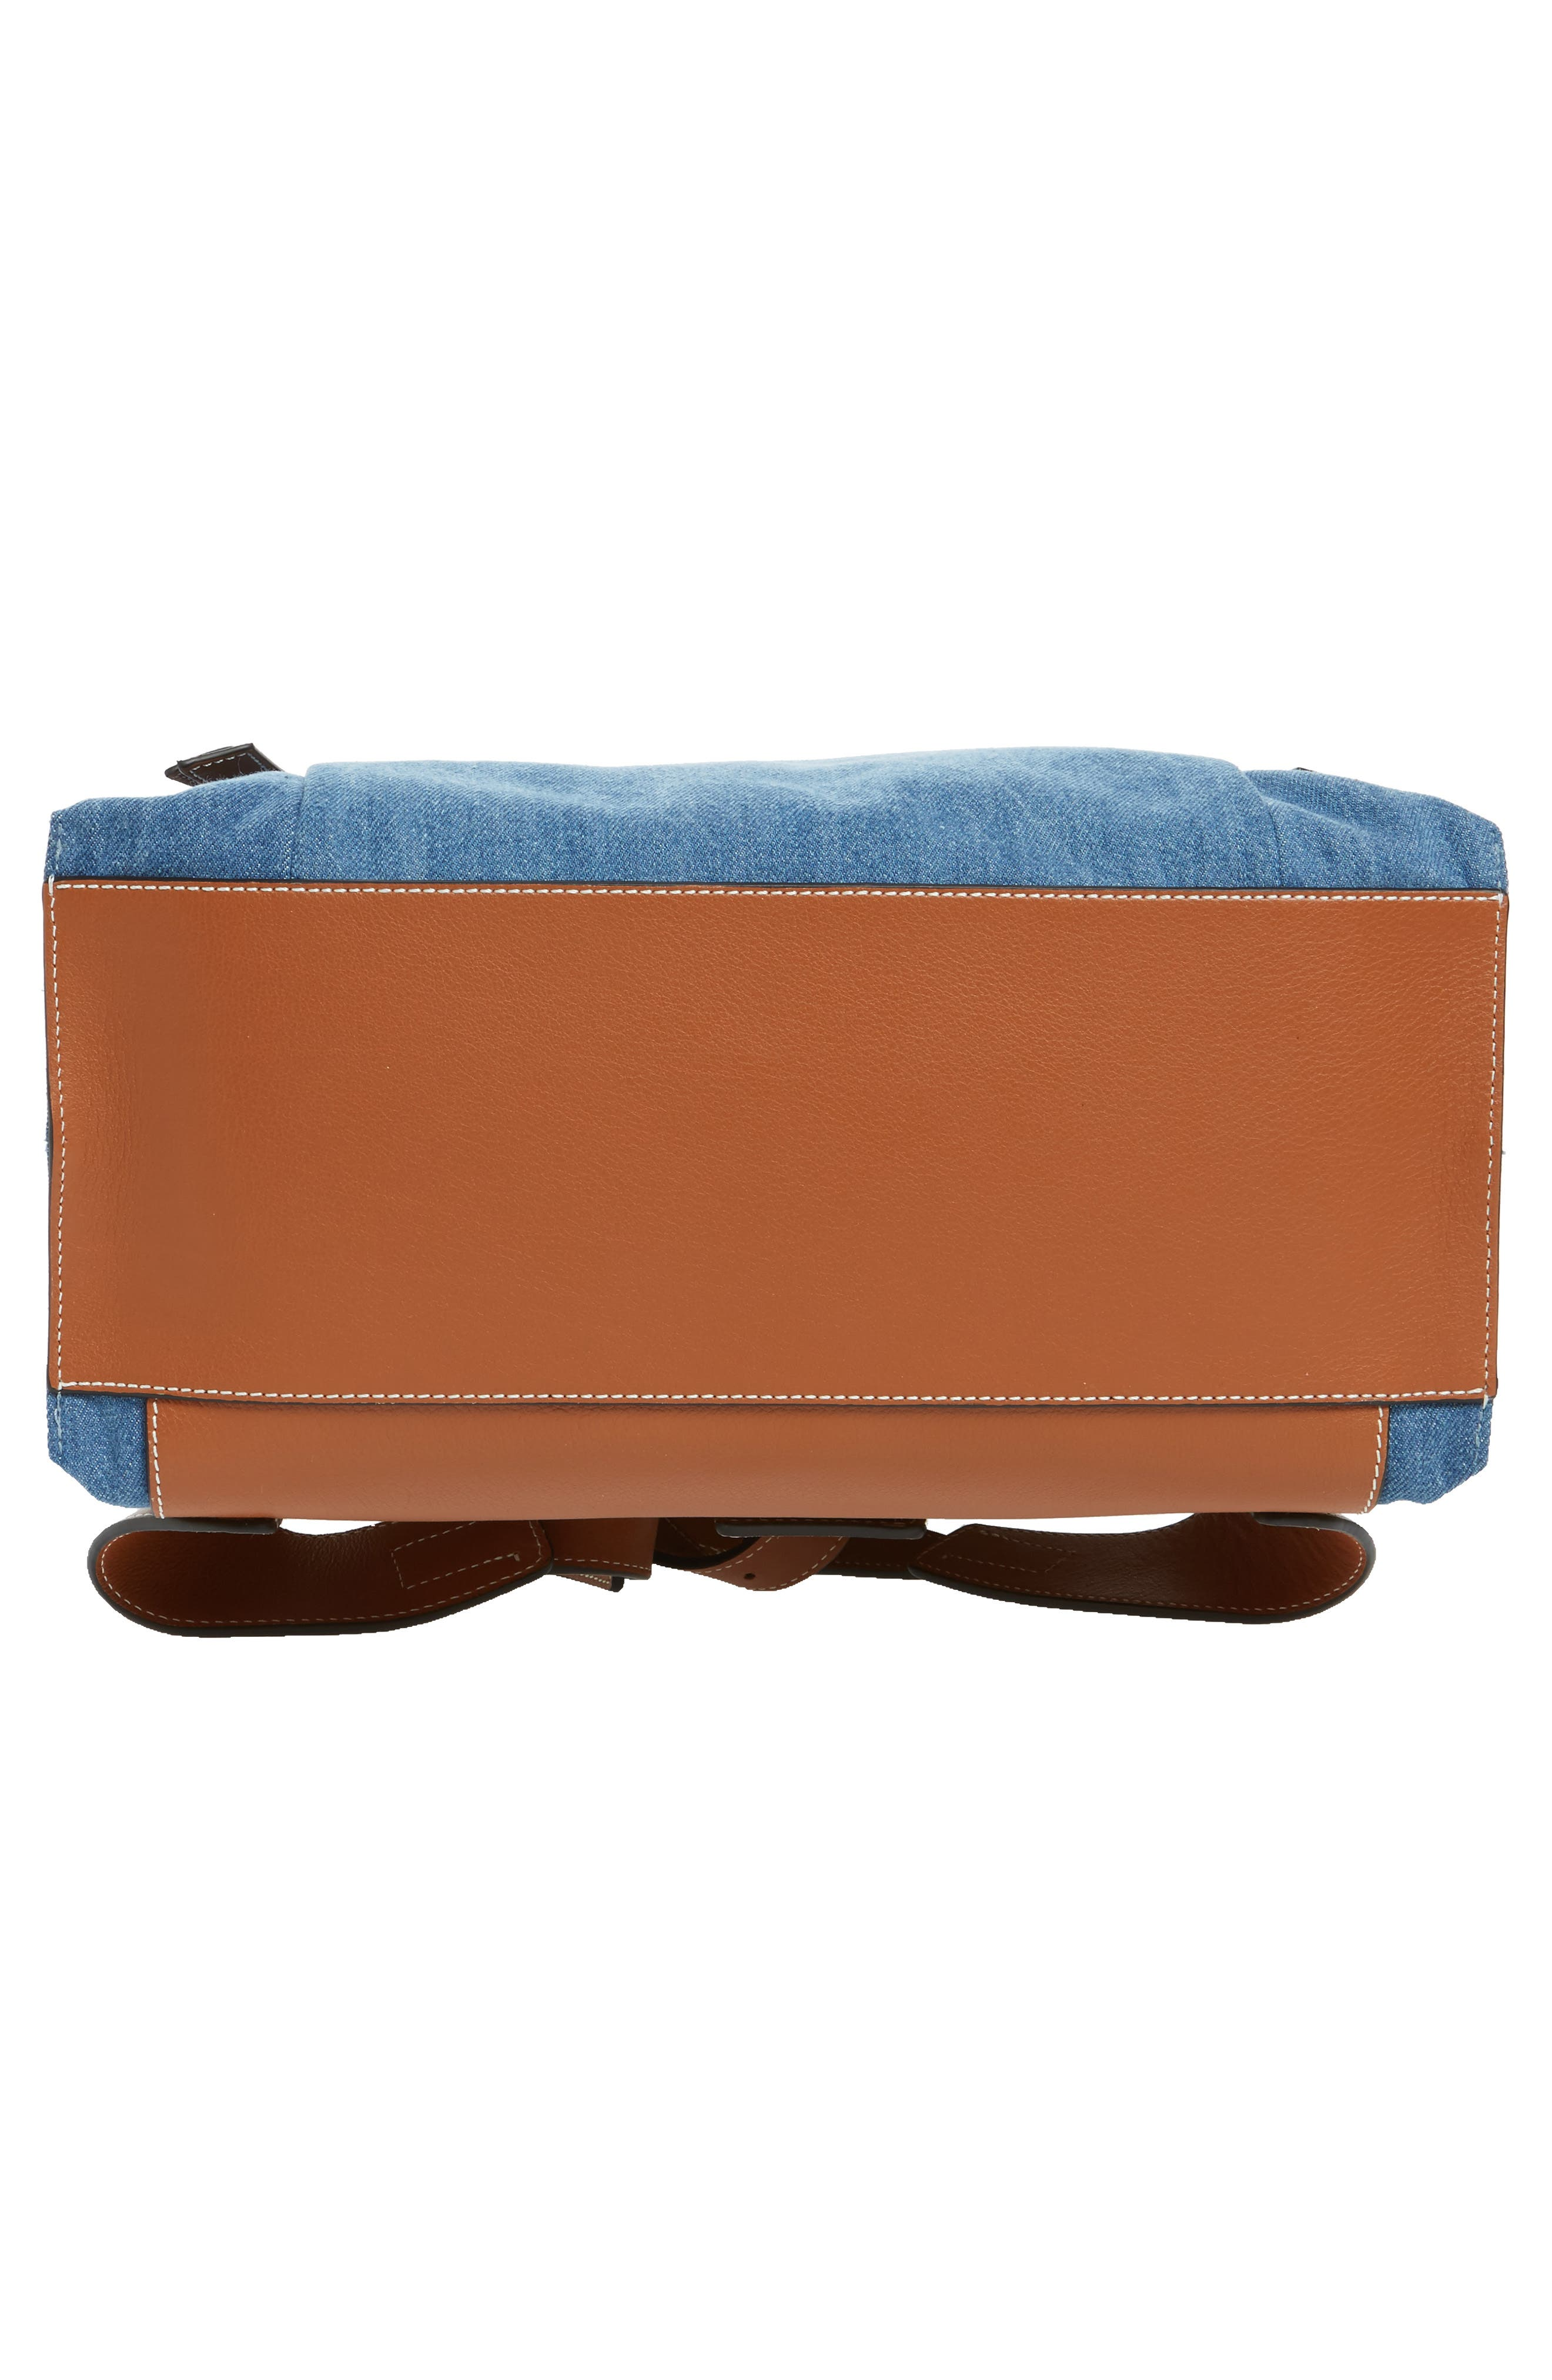 T Small Denim & Leather Backpack,                             Alternate thumbnail 5, color,                             Dark Blue/Tan